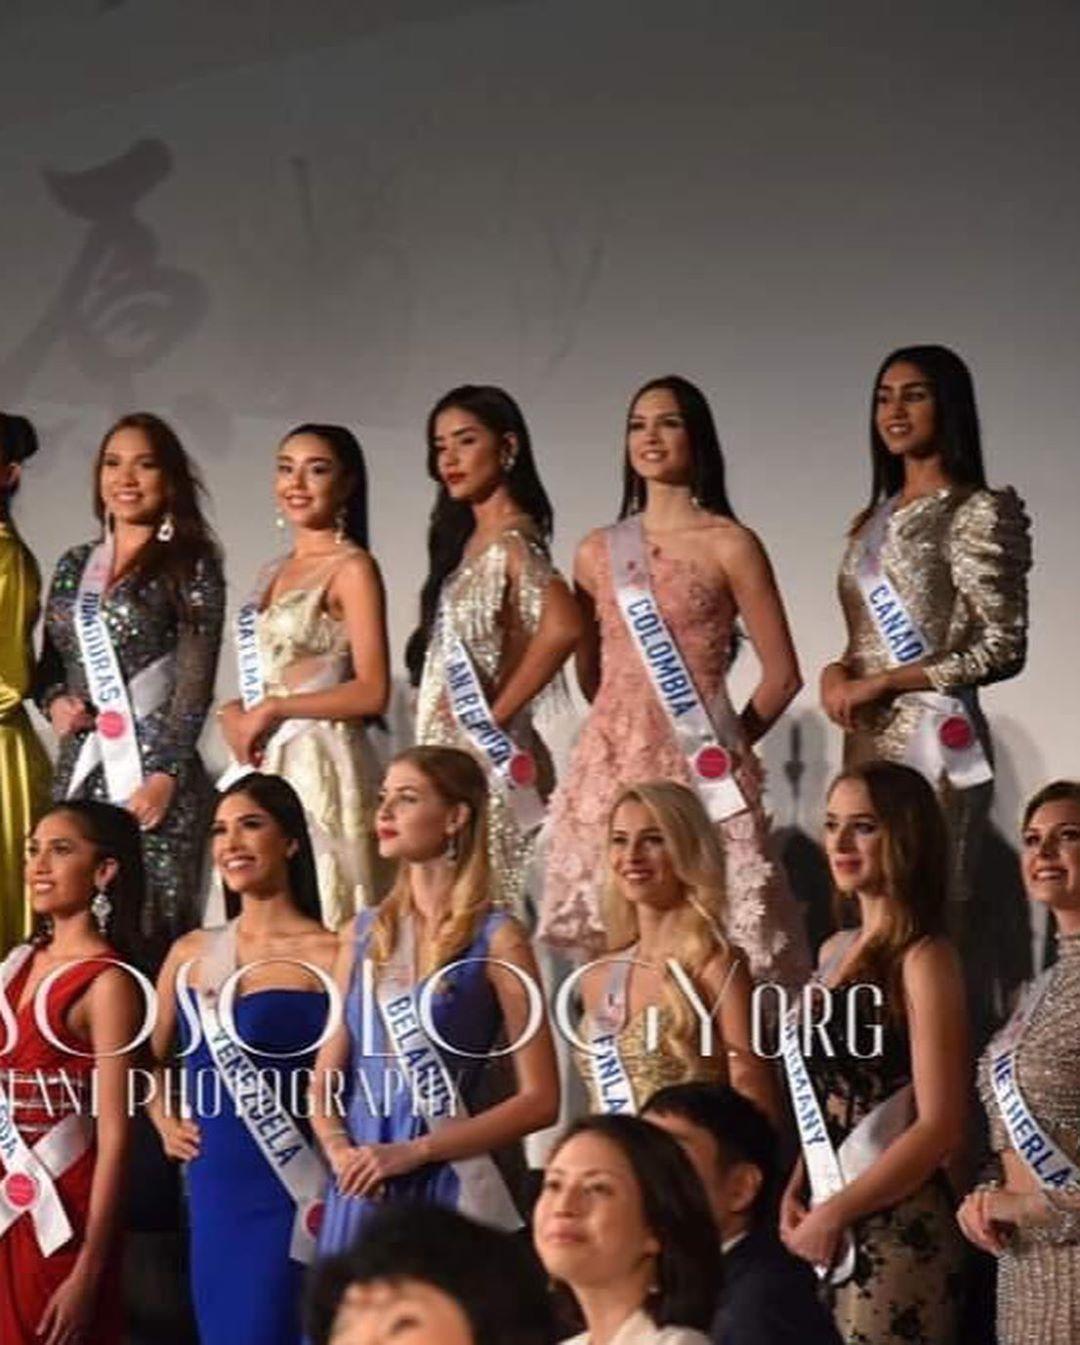 maria alejandra vengoechea, miss colombia hispanoamericana 2021/3rd runner-up de miss international 2019. - Página 6 72891010